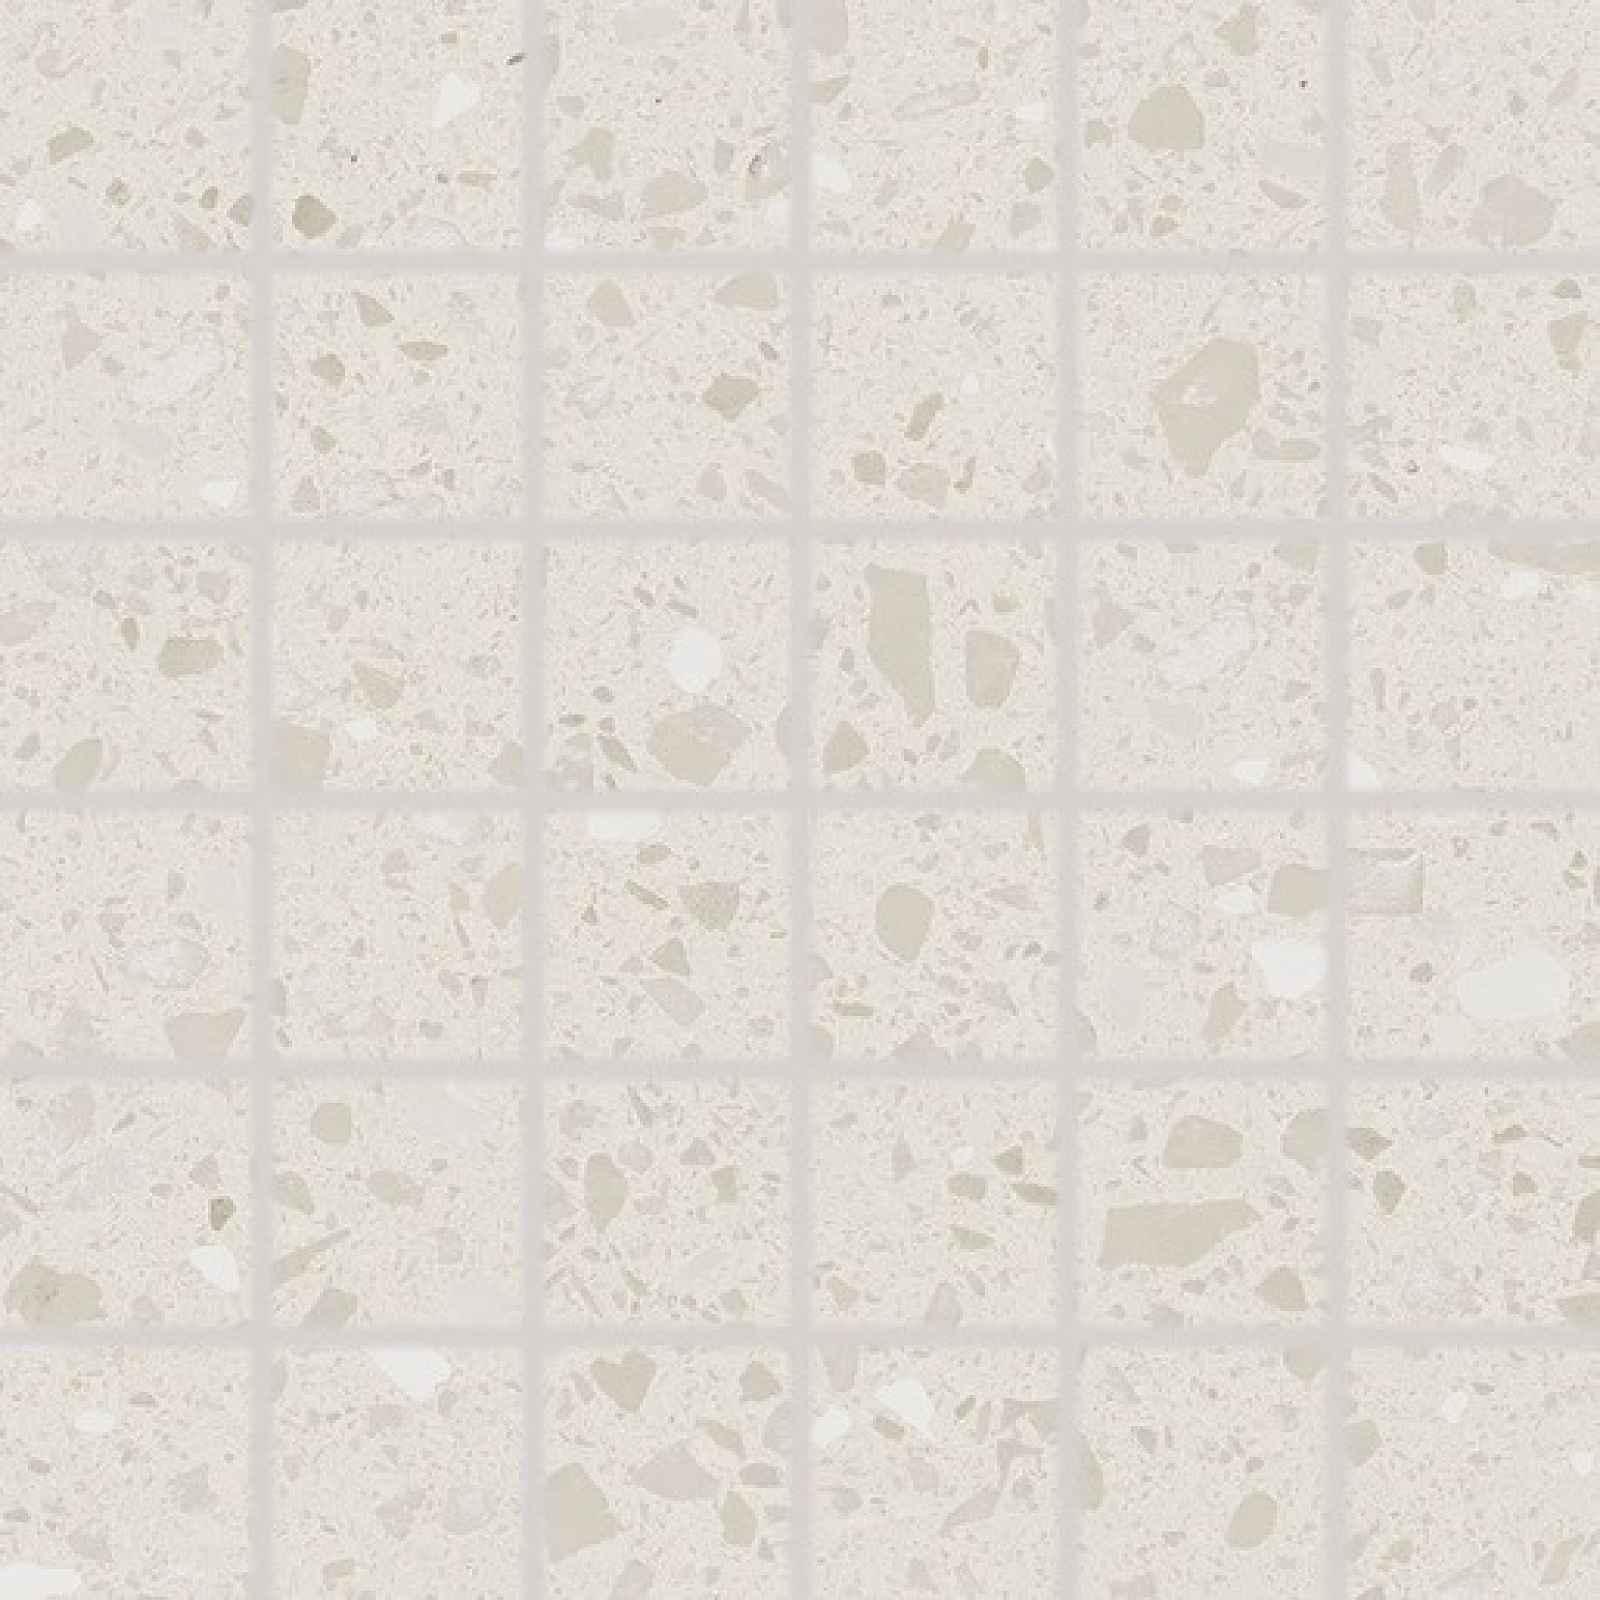 Mozaika RAKO Porfido béžová 30x30 cm mat / lesk DDM06813.1